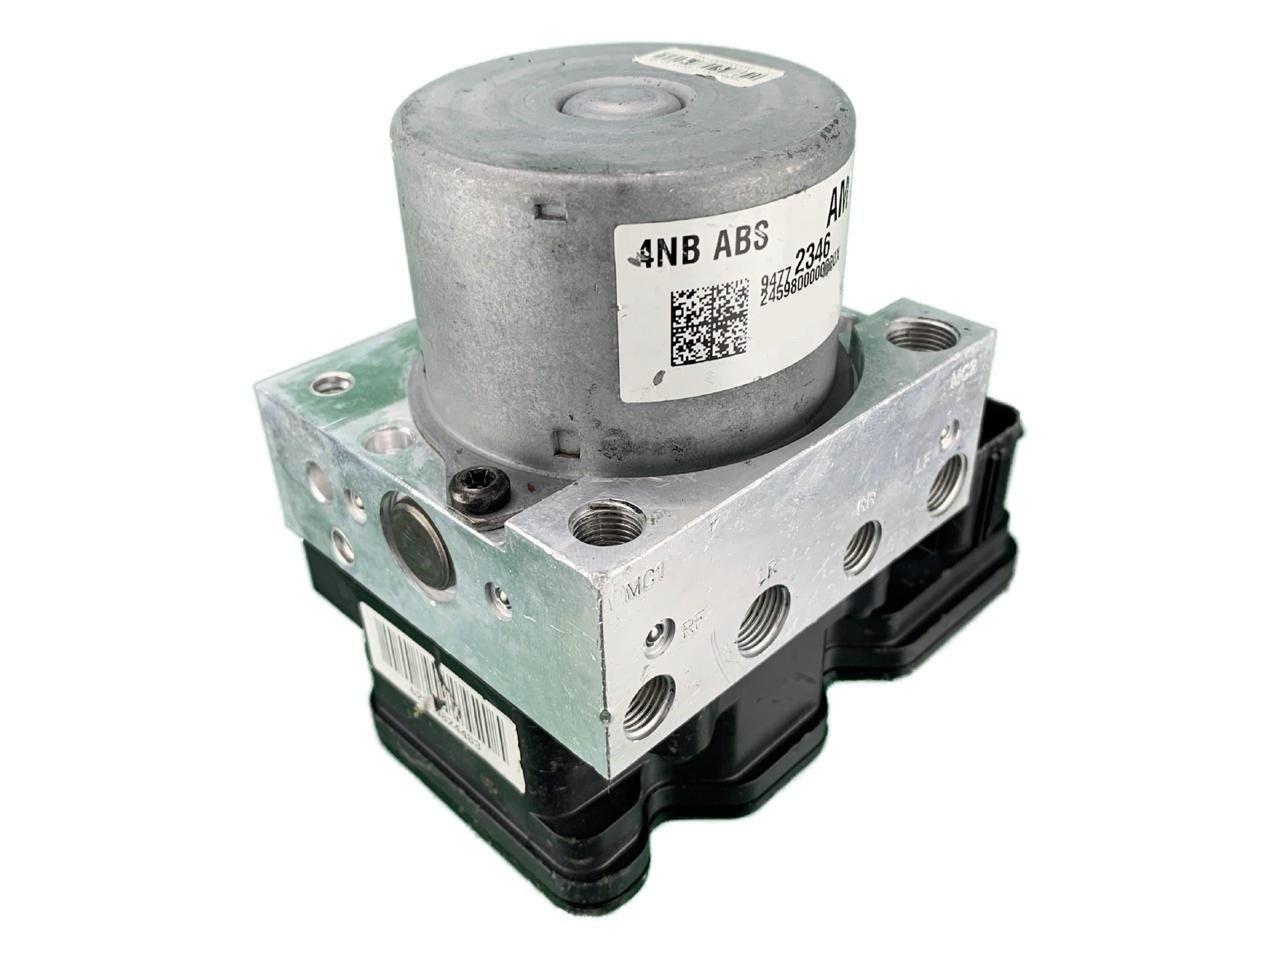 Unidade Hidraulica Bomba Modulo Central Centralina Motor de Freio Abs Valvula MANDO  J92AAC1A1121303 5wy7d03c AMY 94772346 Gm Cobalt 012 013 014 015 016